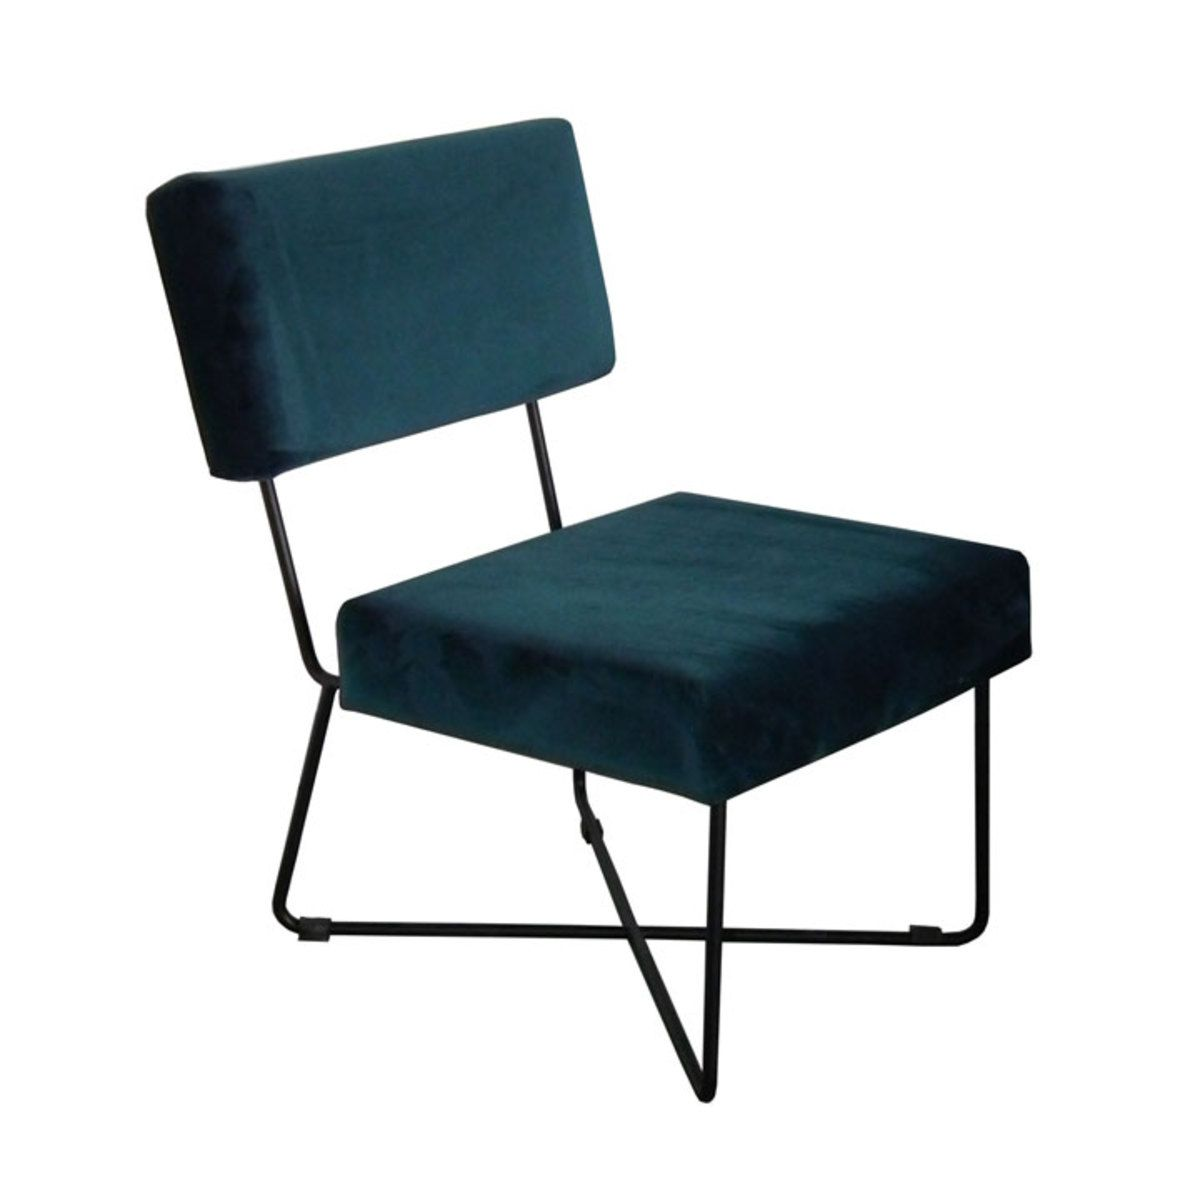 achat athezza fauteuil kaline bleu canard 517002 pas cher sur maginea la - Fauteuil Bleu Canard Pas Cher